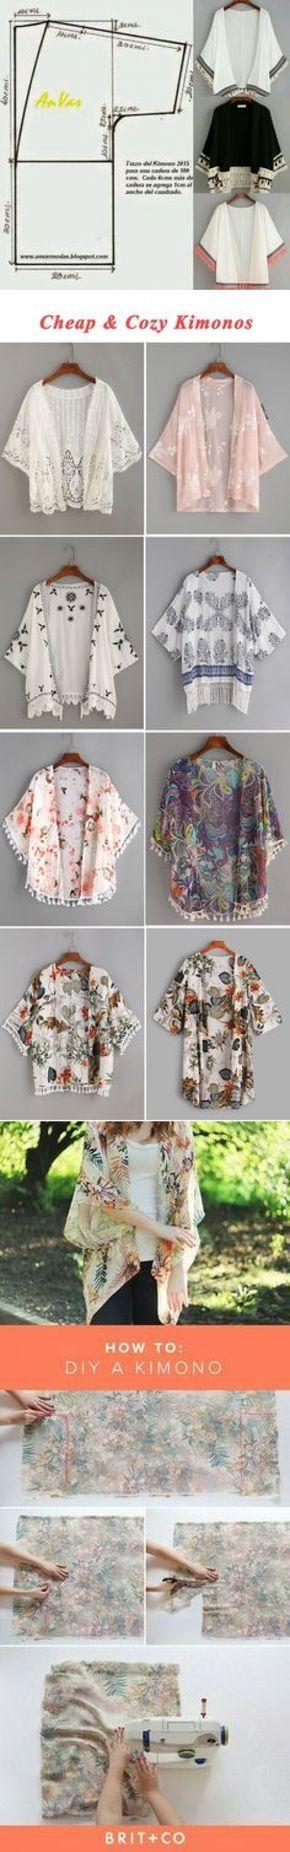 Patrón fácil de kimono. Pinterest